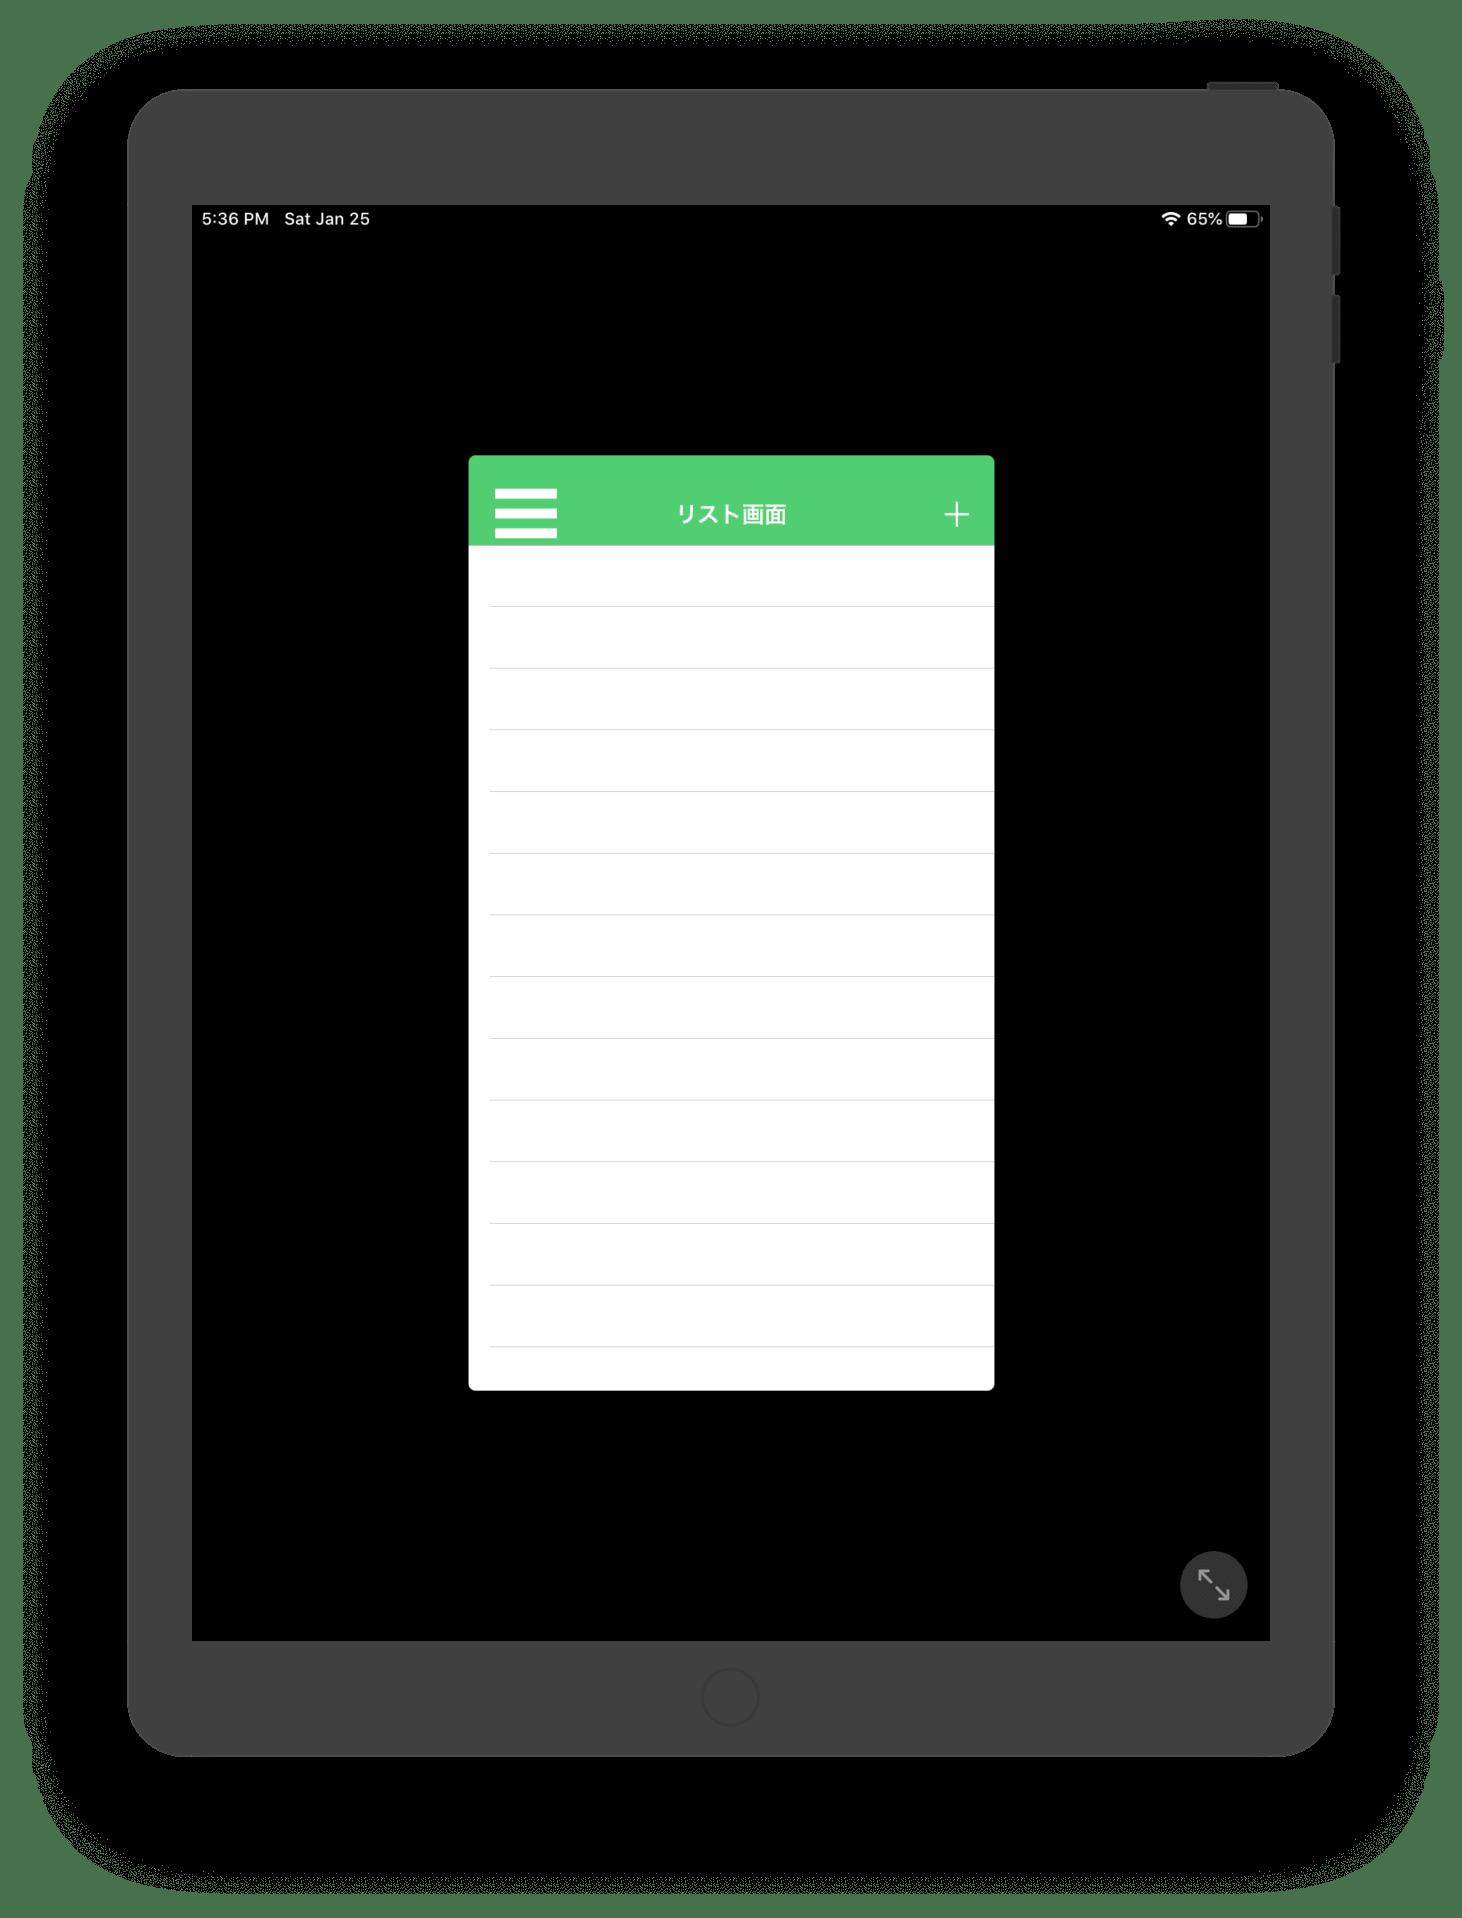 iPadでiPhoneのような表示をする画像